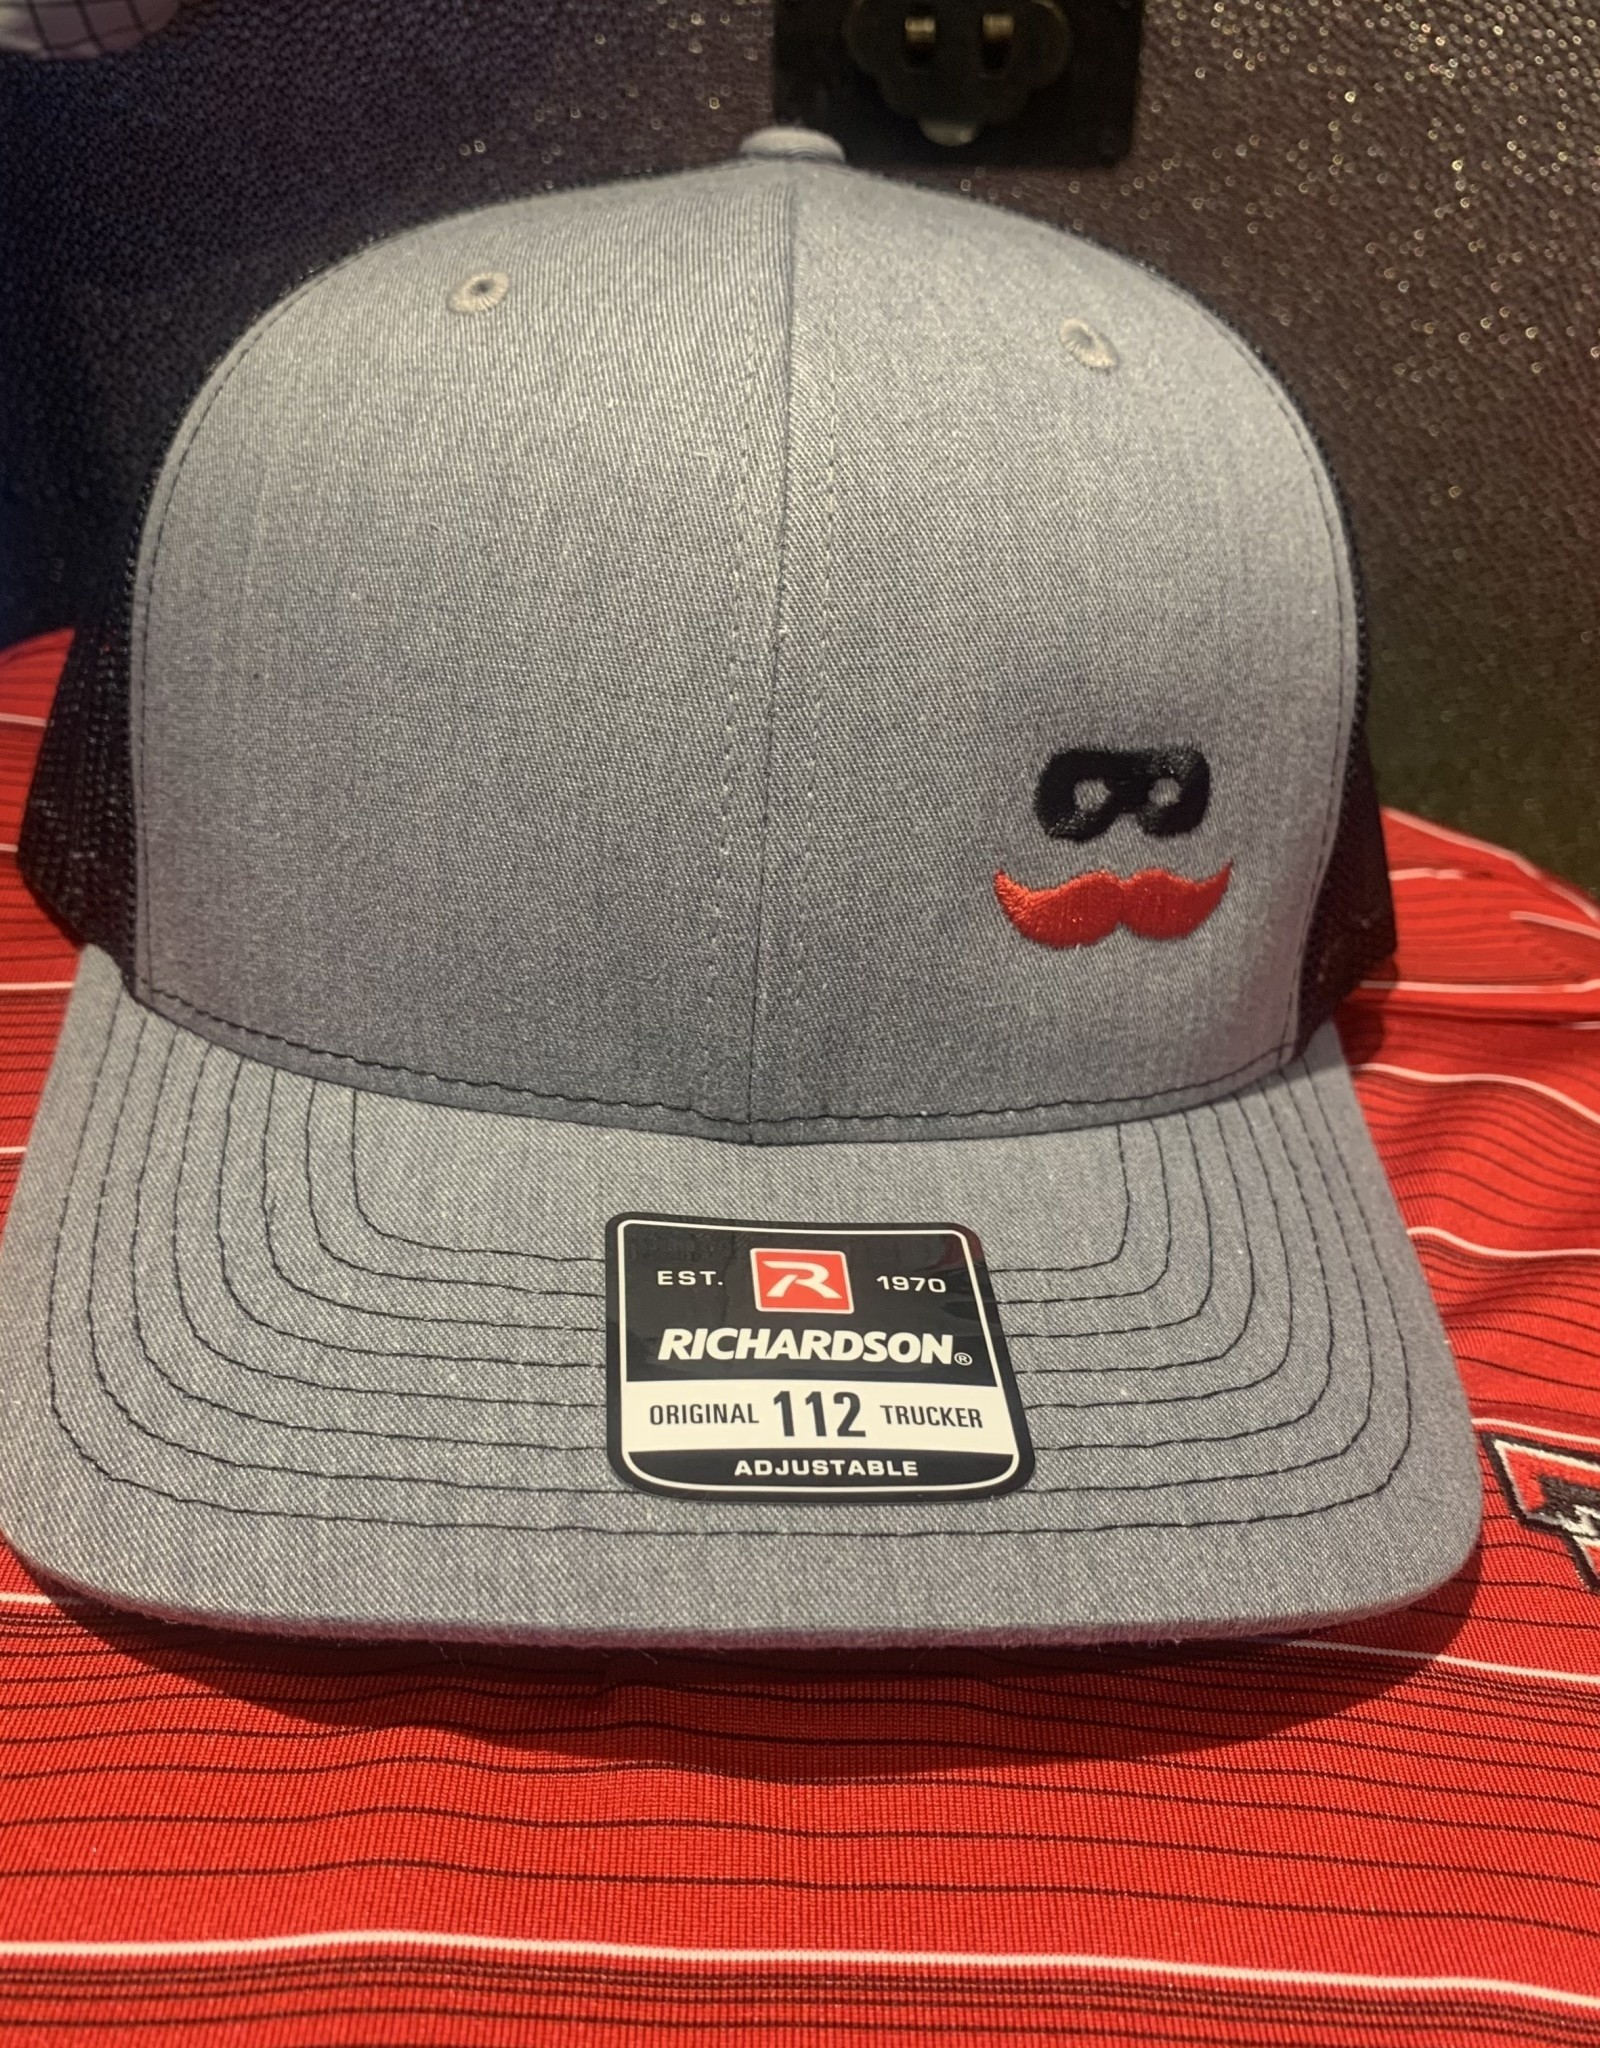 Stag GameDay Richardson 112  Hat Grey/Black Side Mustache